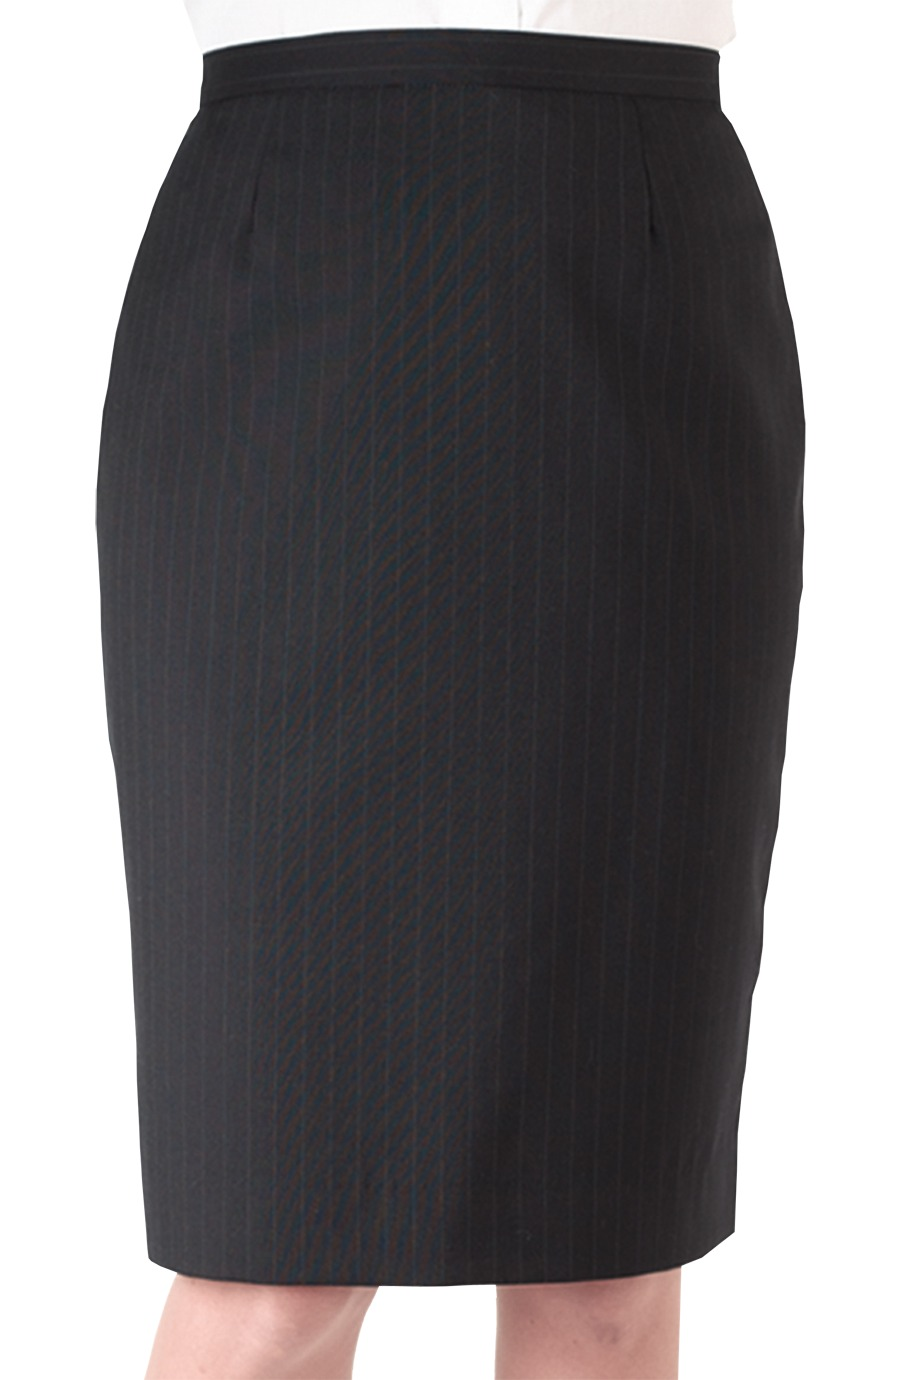 Edwards Garment 9769 - Women's Pinstripe Skirt